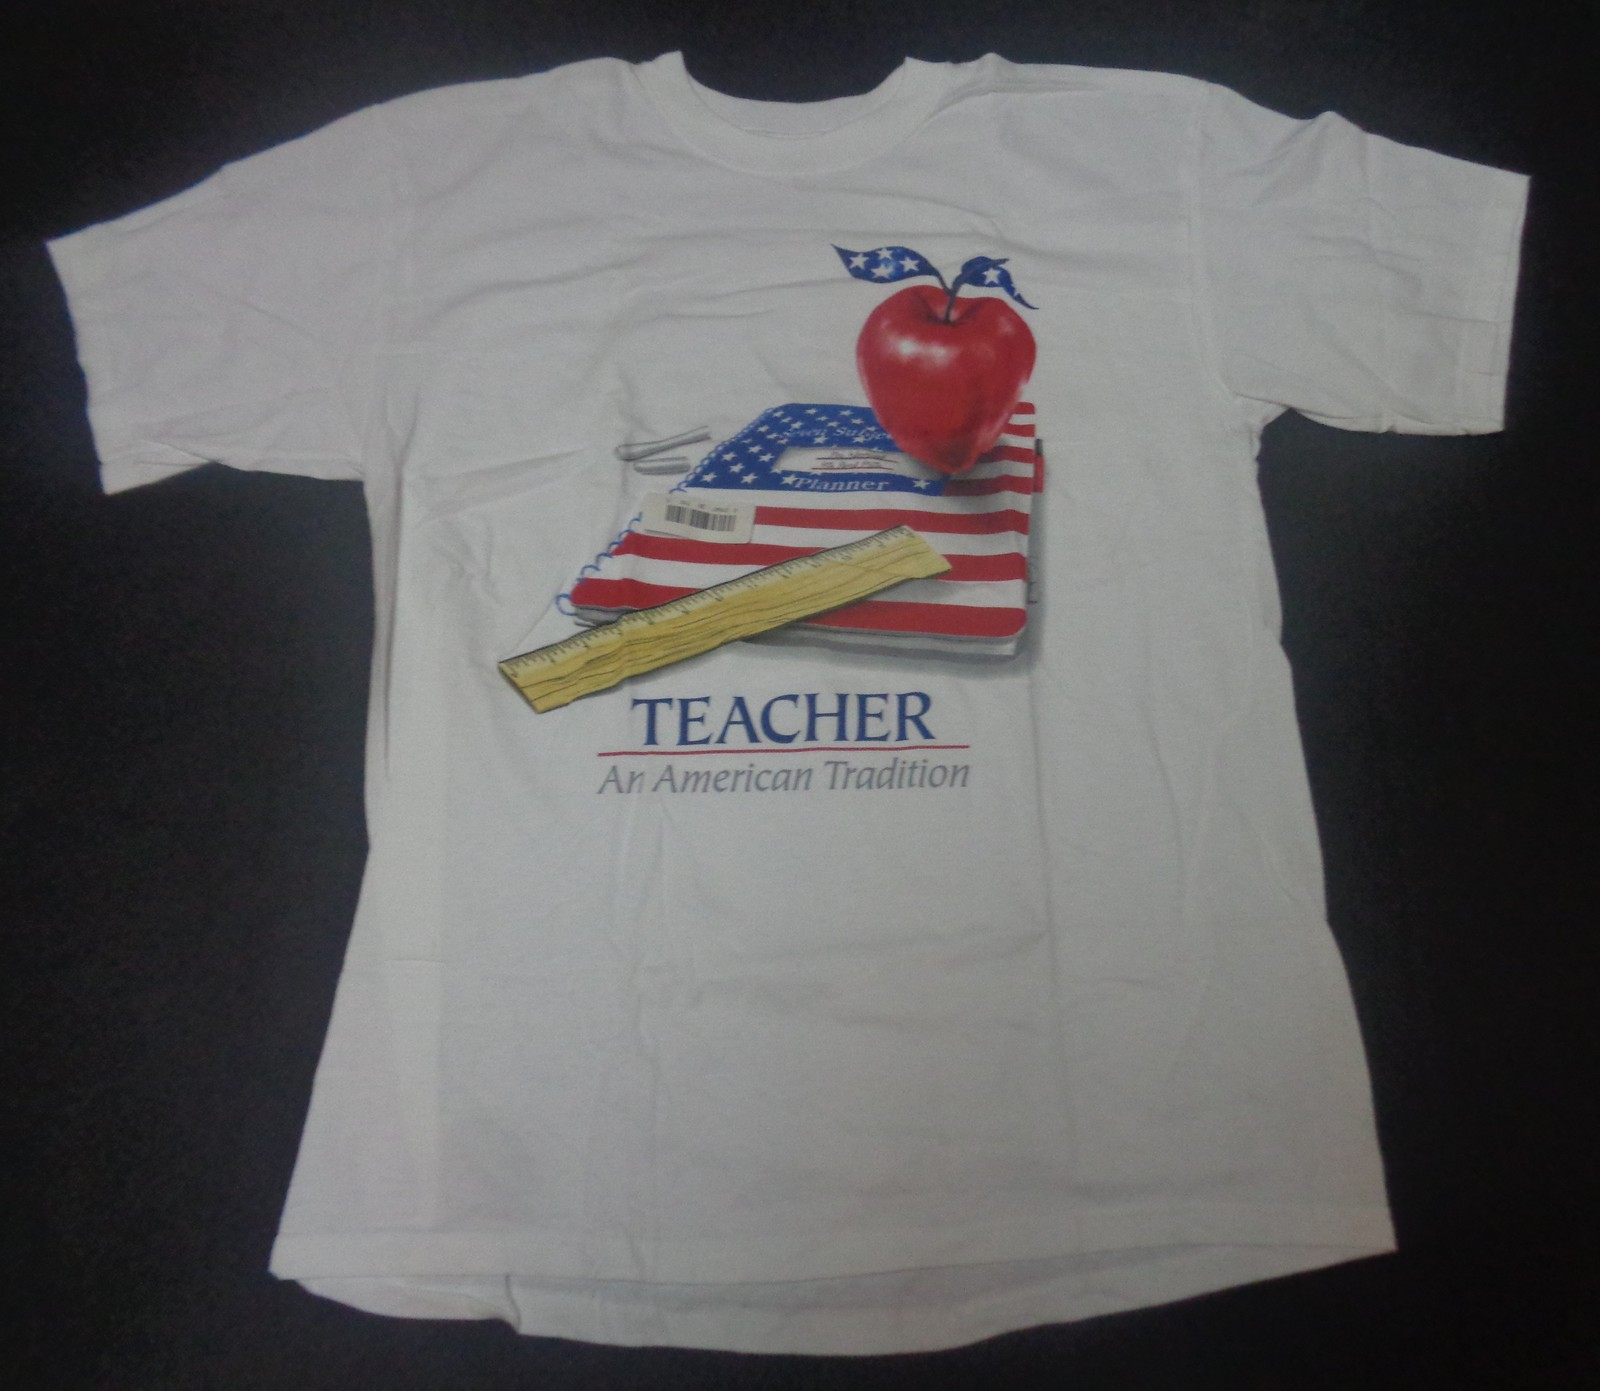 TEACHER AN AMERICAN TRADITION T-Shirt NWOT Sz Large Anvil Pre-Shrunk